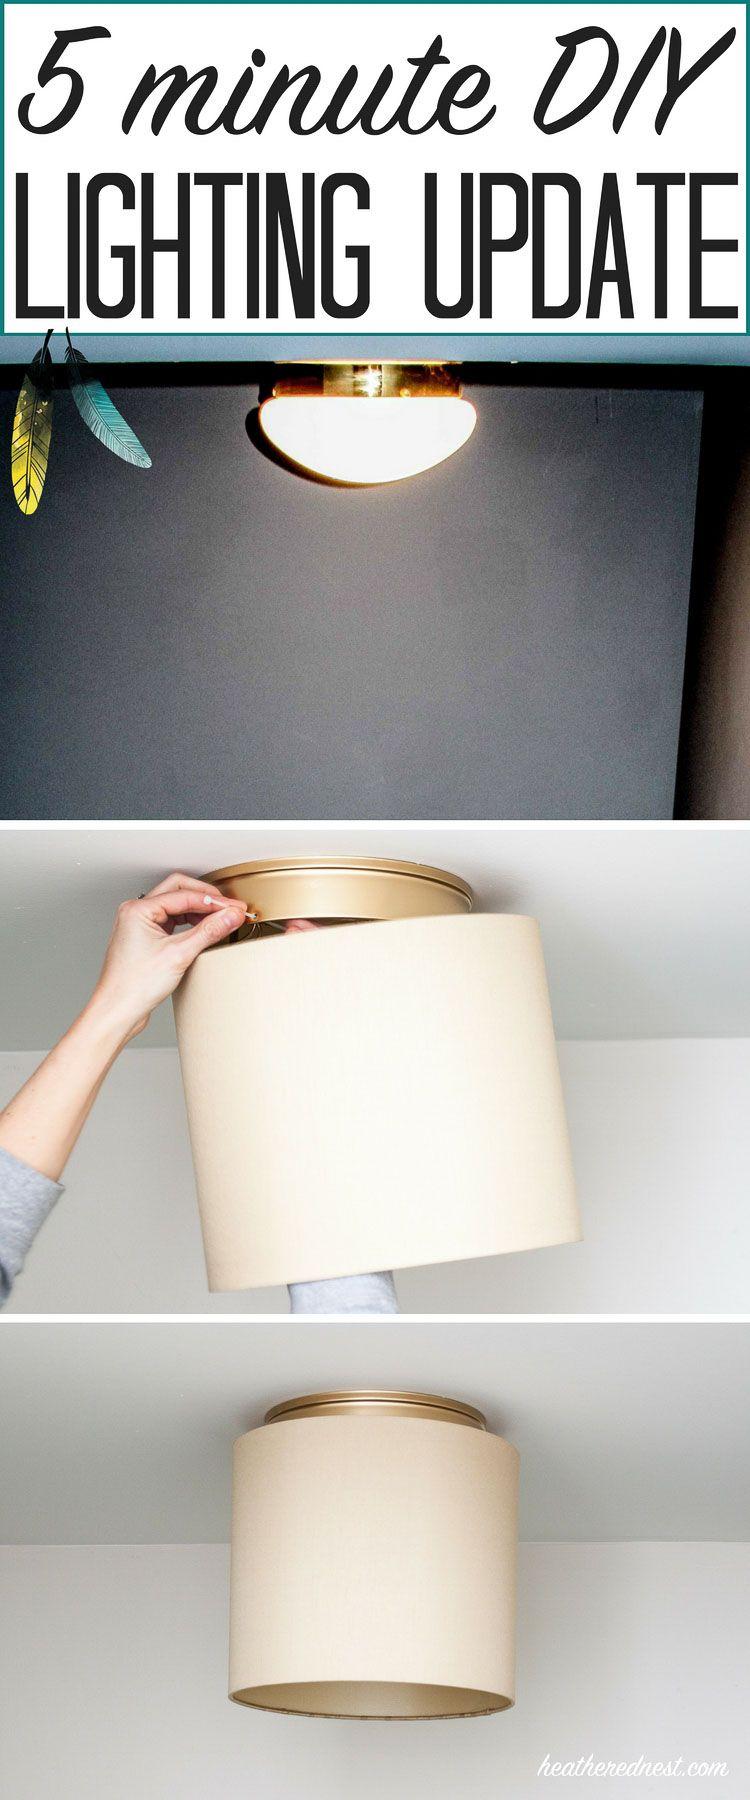 2 DIY Lighting Tutorials to Modernize Boob Lights   home   Pinterest ...